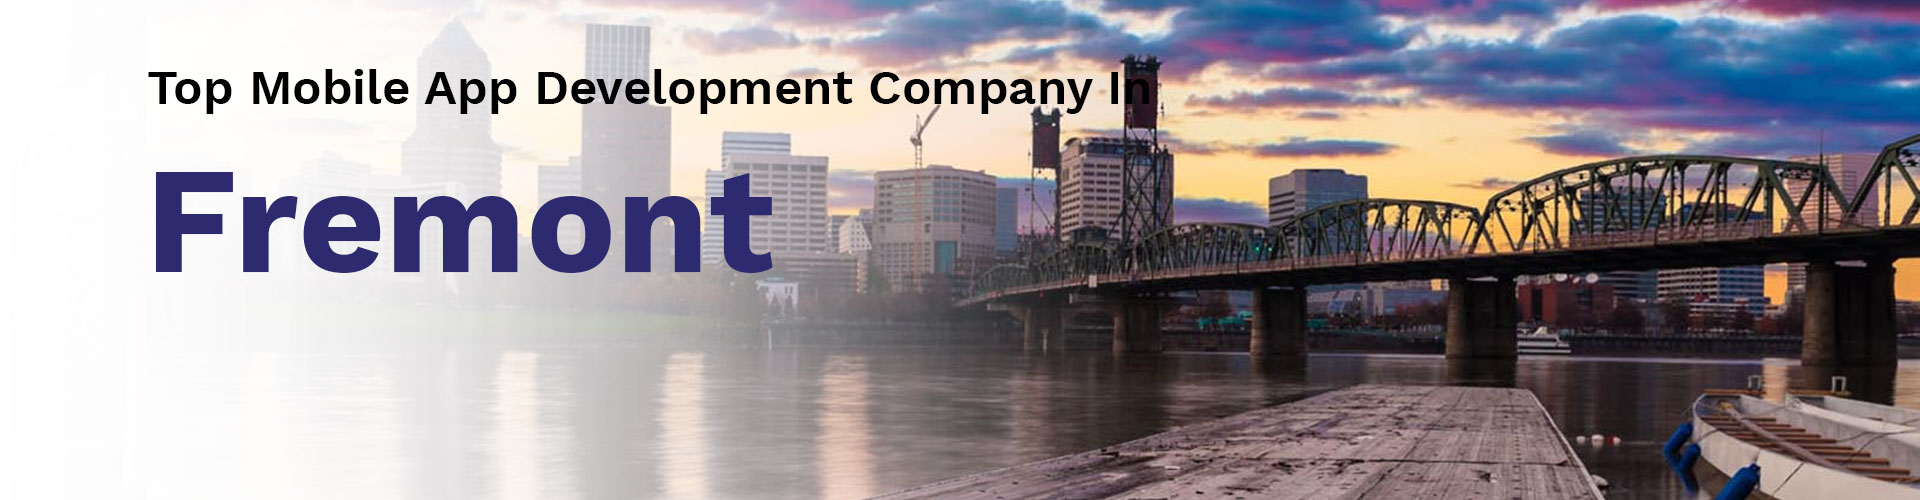 mobile app development company fremont